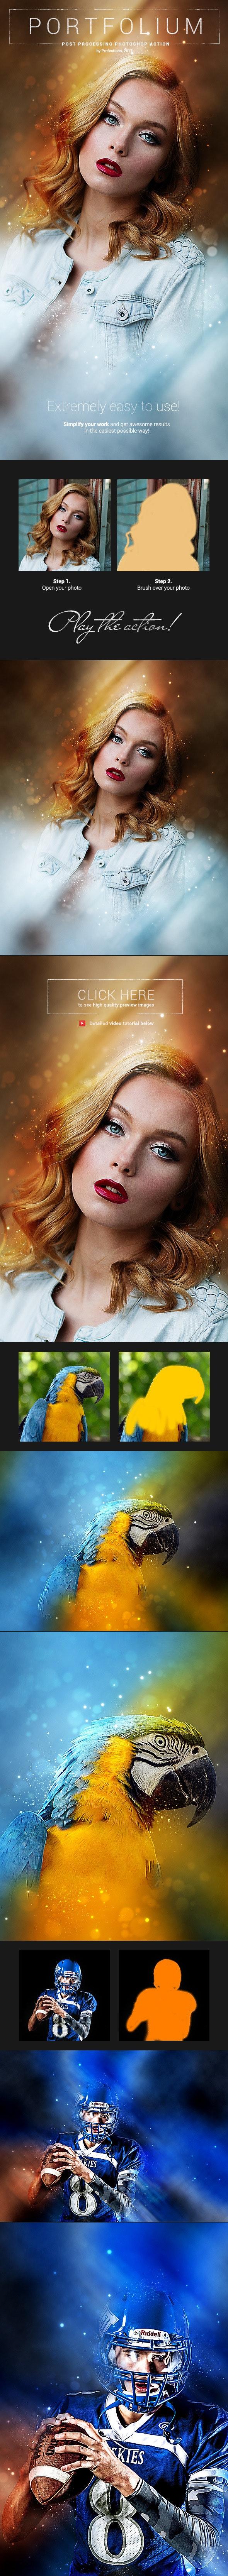 Photo Portrait - Portfolium - Photoshop Action